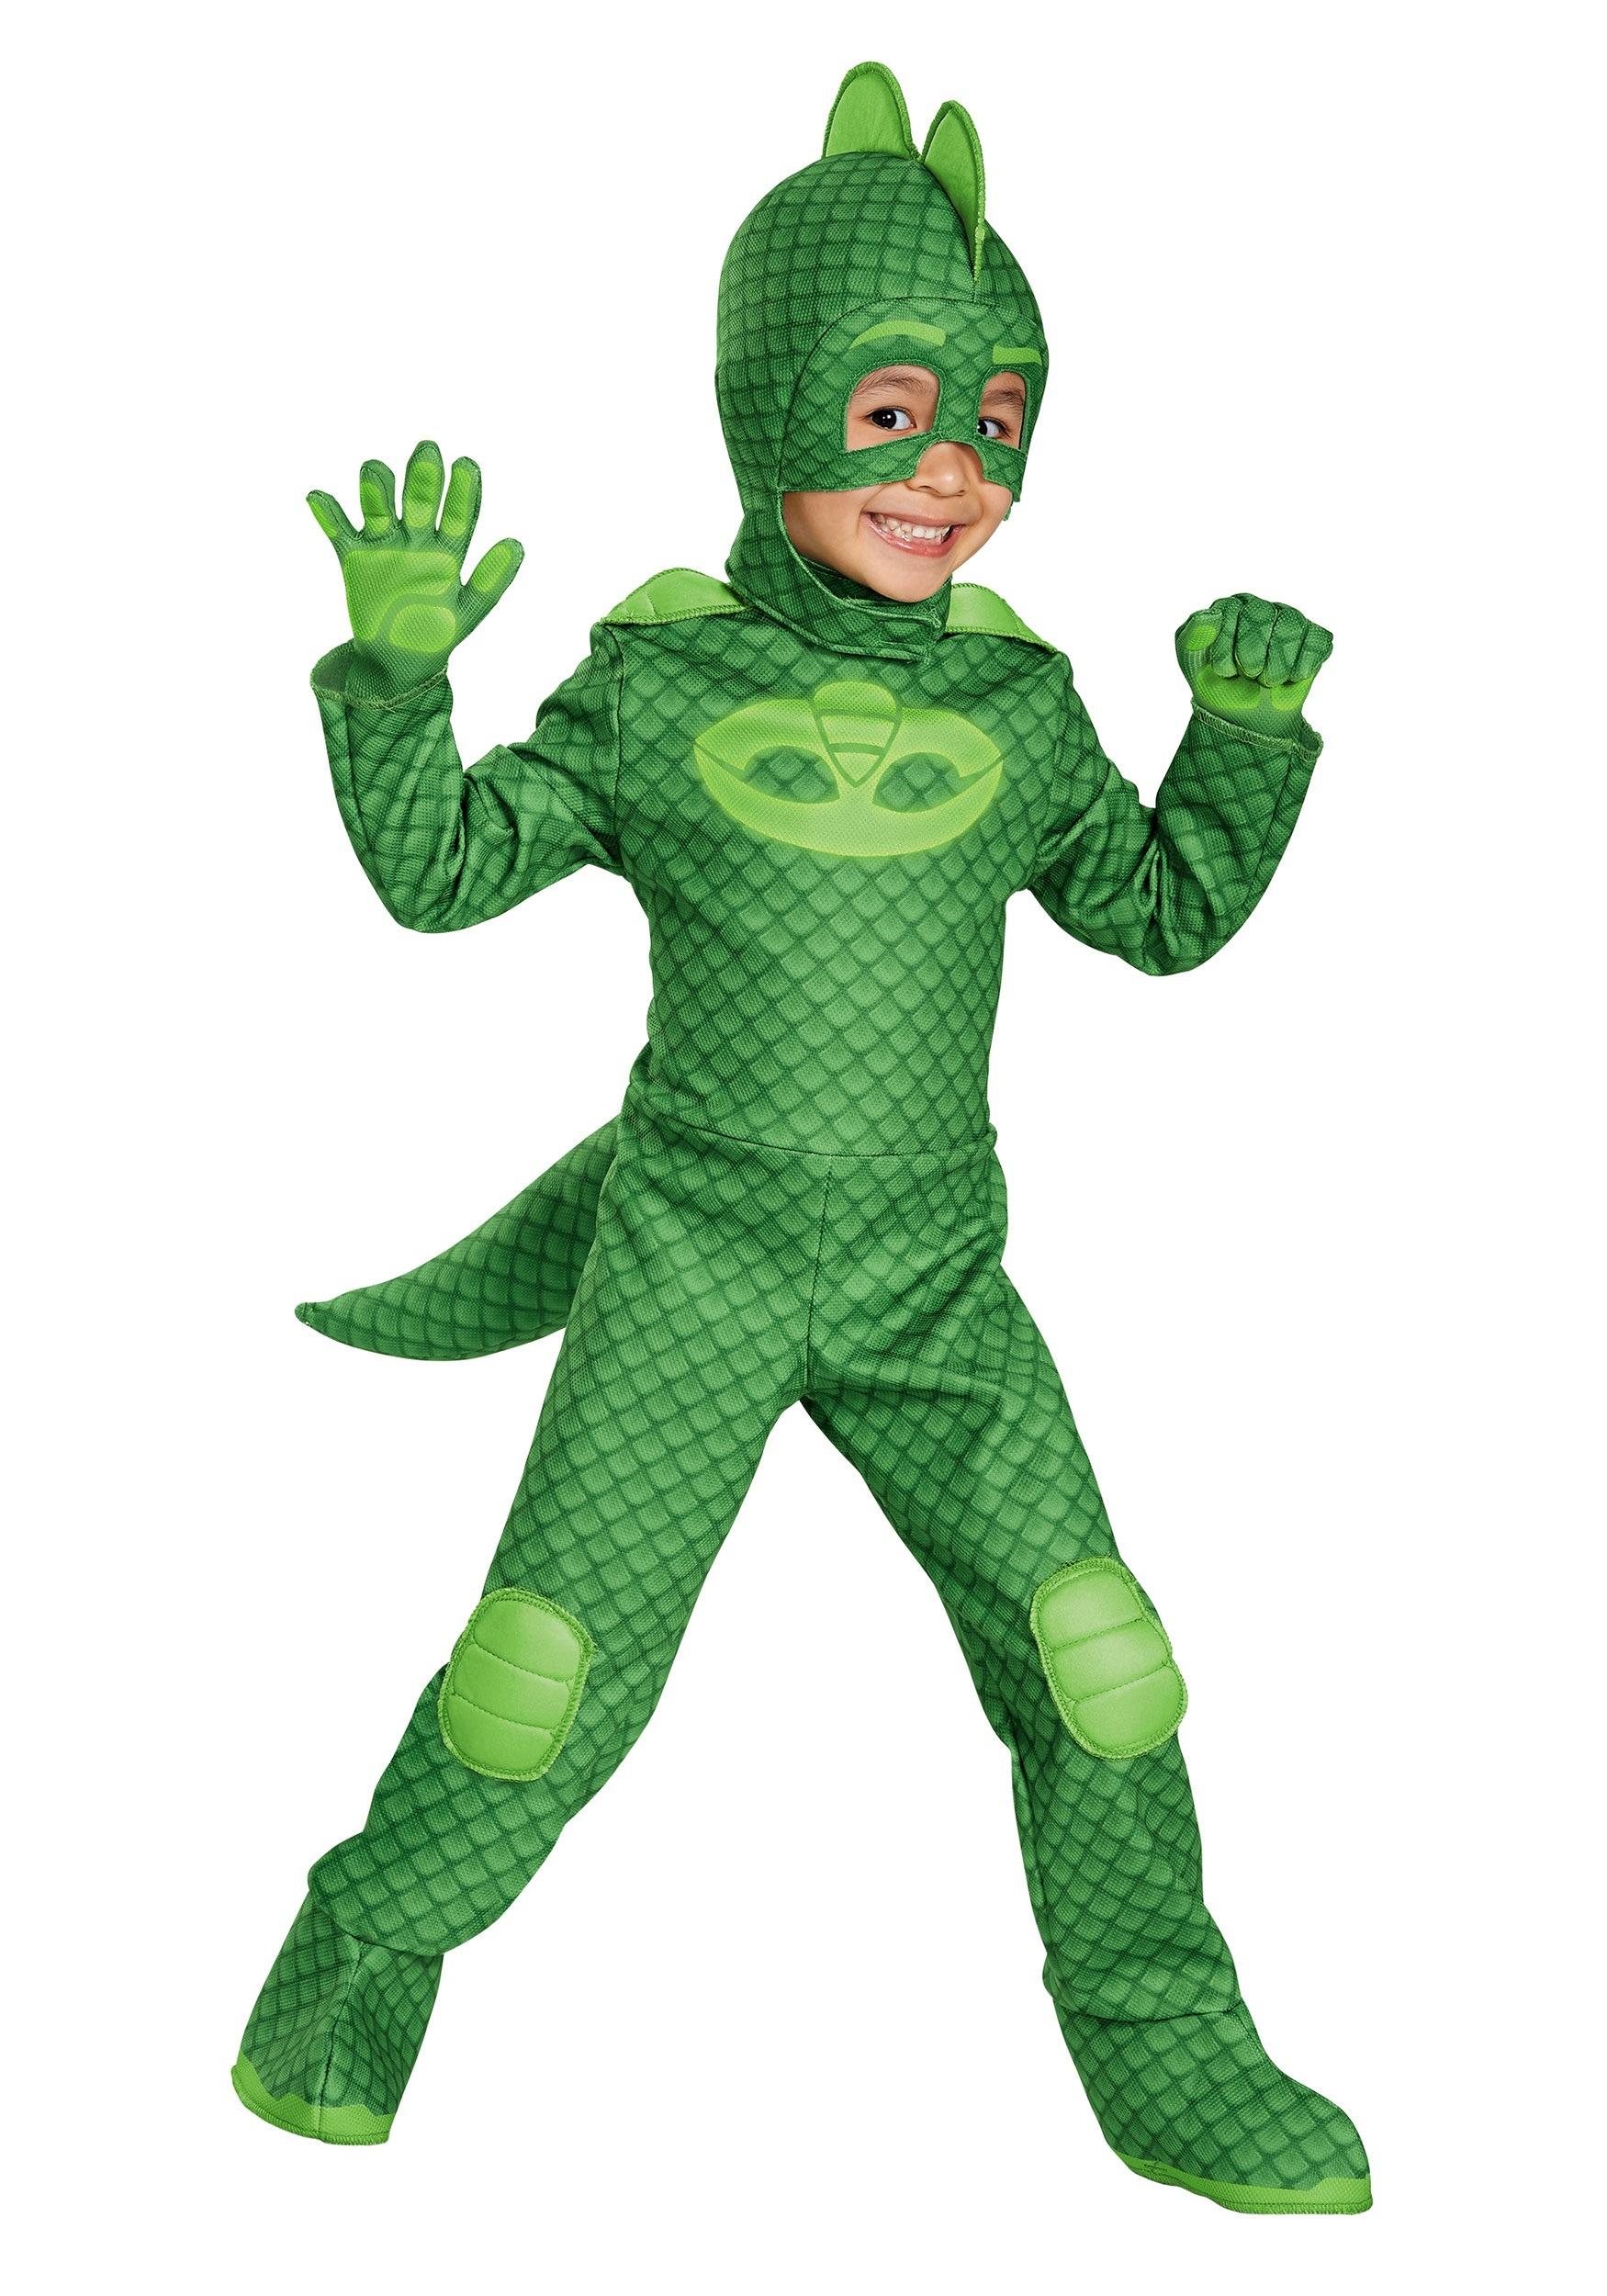 Boys Deluxe Gekko Costume from PJ Masks   Kids Halloween Costume